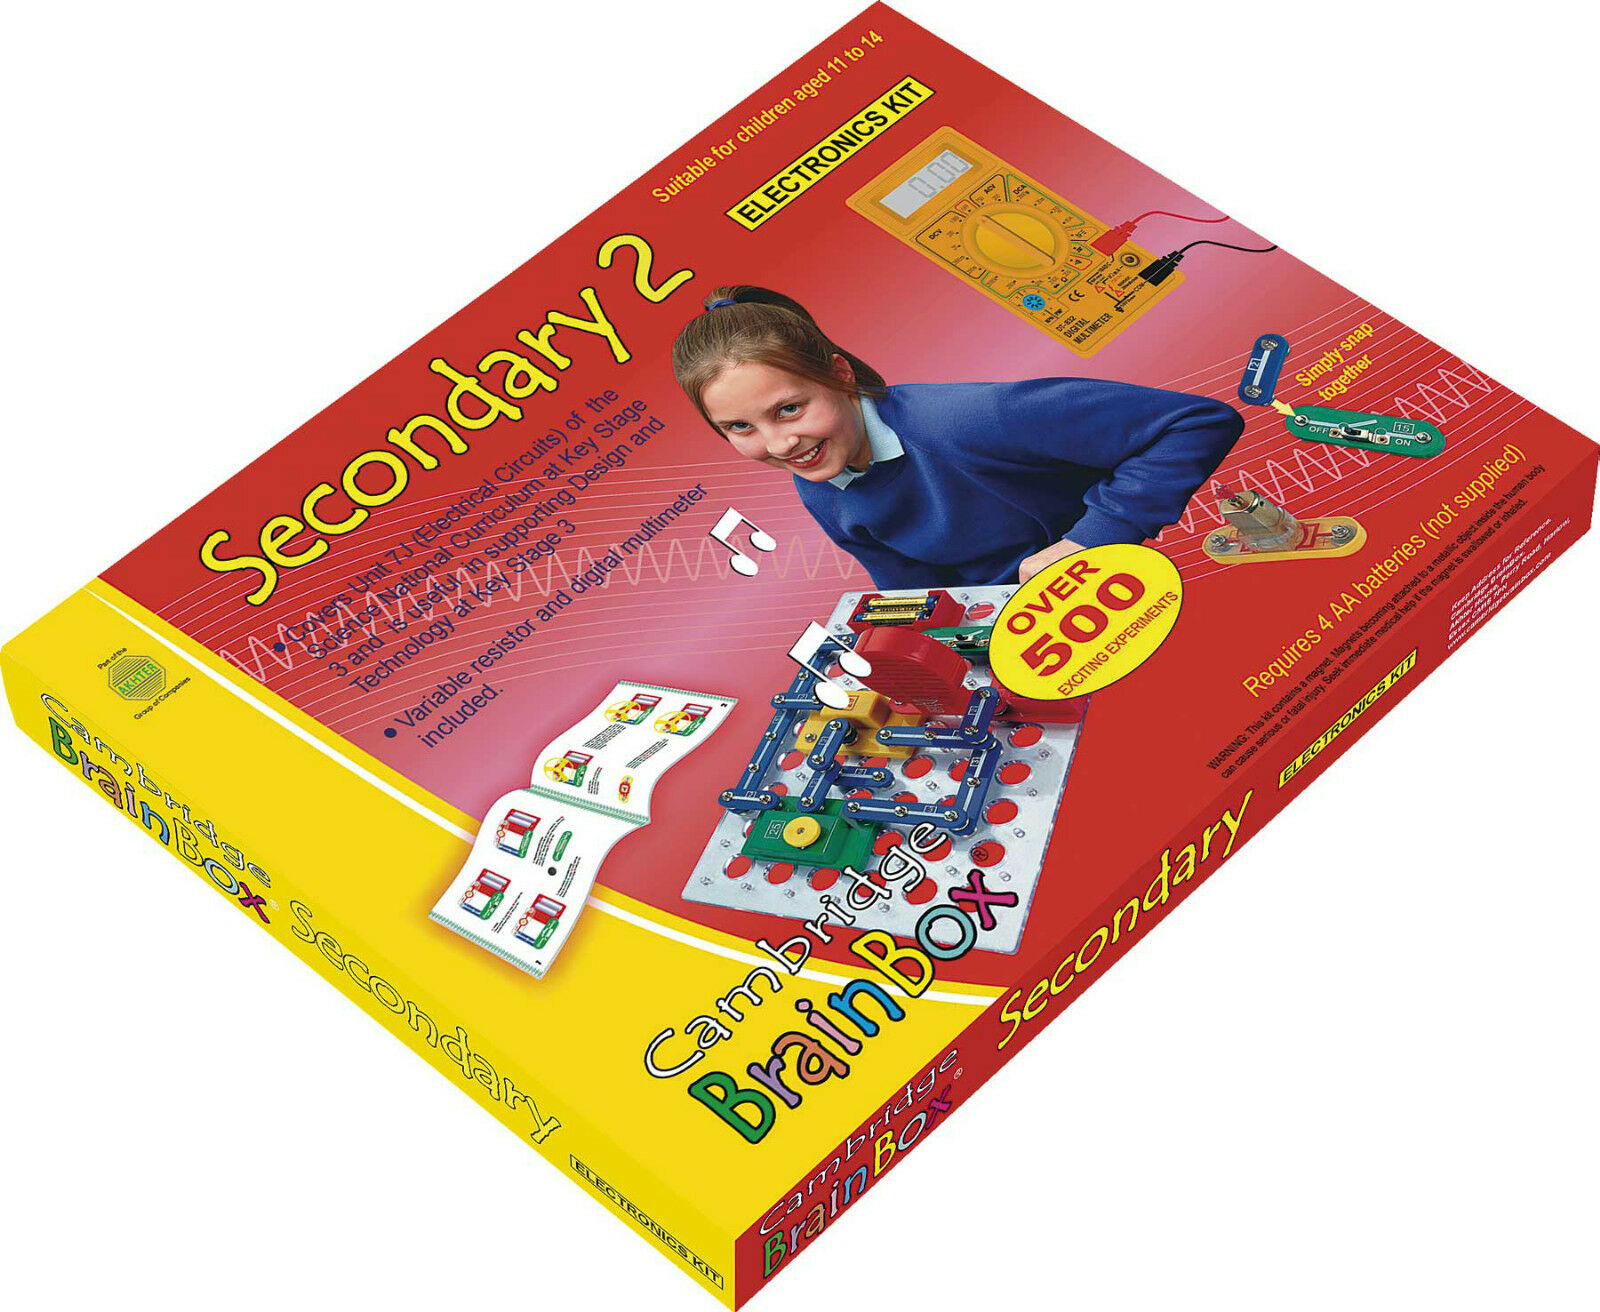 Cambridge Brainbox Secondary 2 Electronics Kit